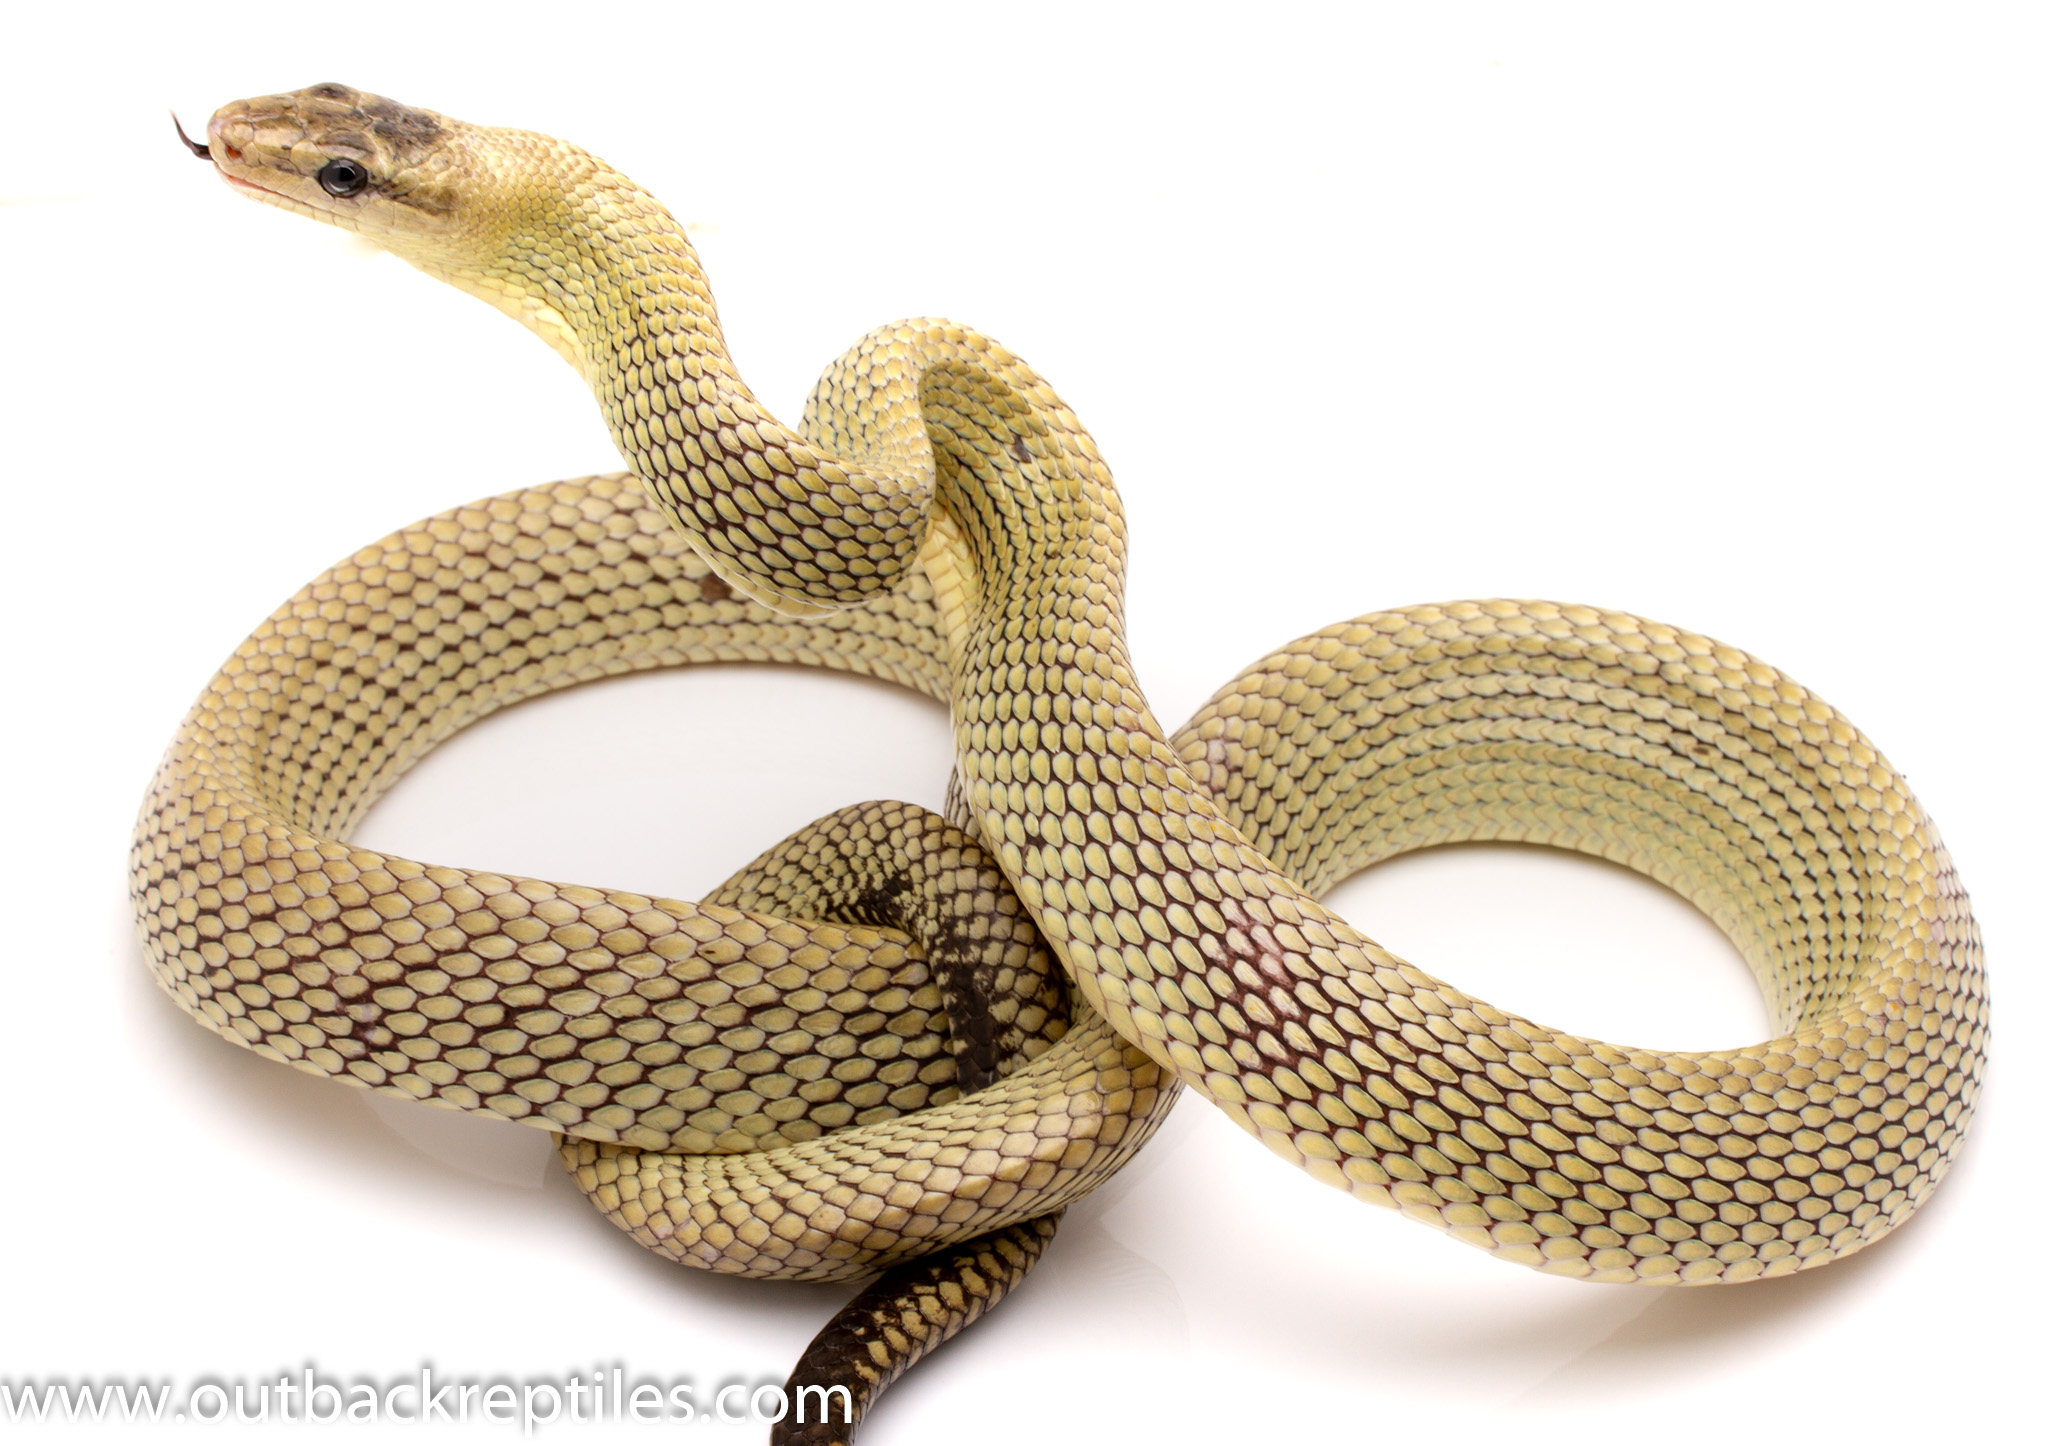 Jansens rat snake for sale